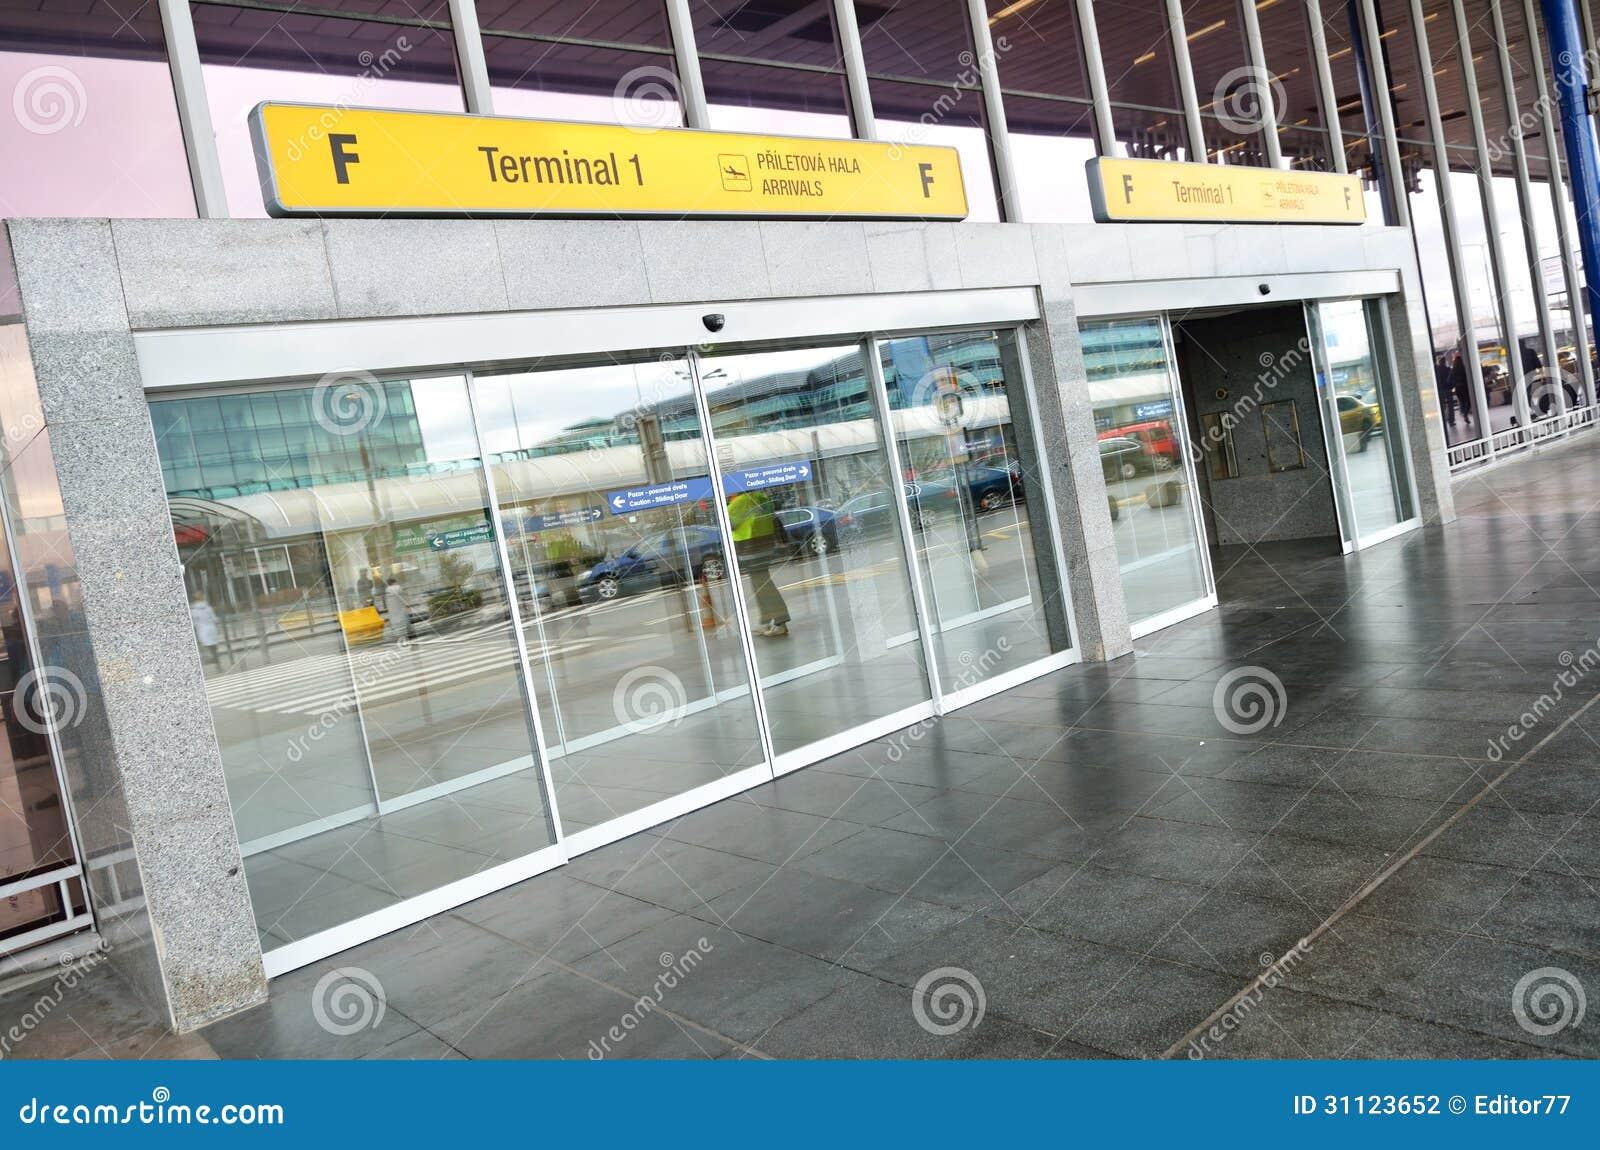 Terminal 1 entry of vaclav havel airport prague editorial for Terminal exterior 15 kv